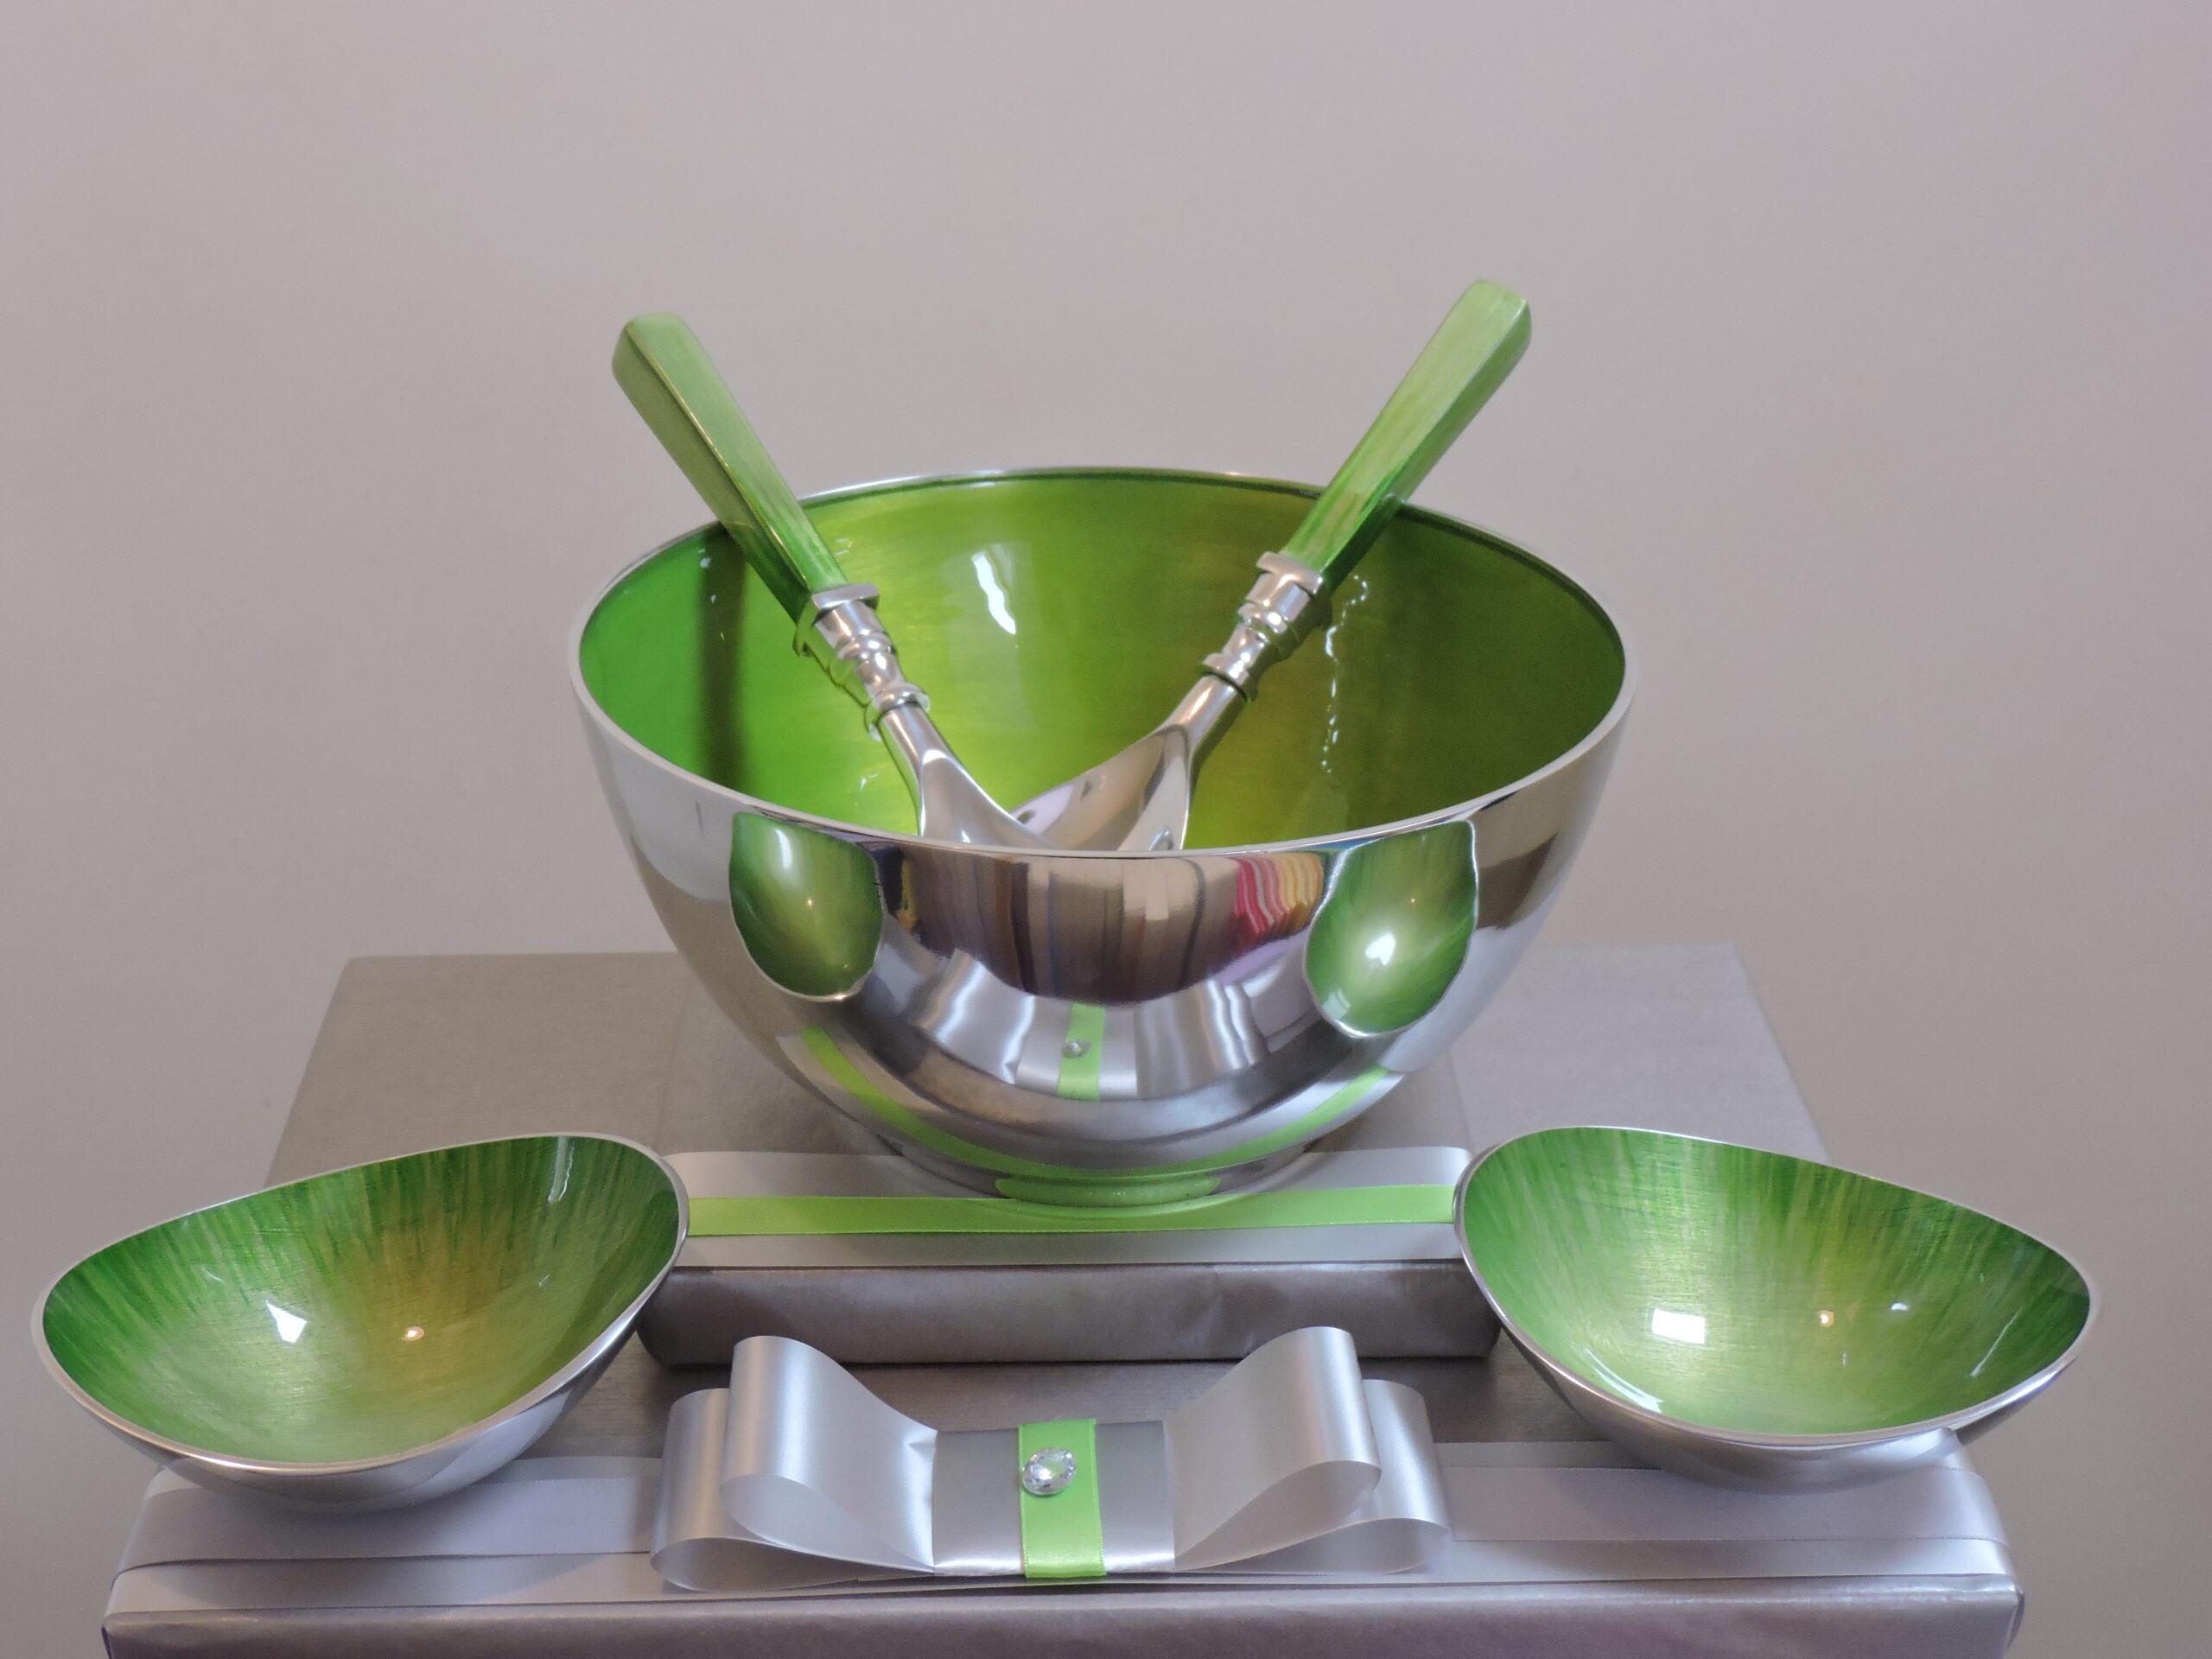 Lime Salad & Dip Set